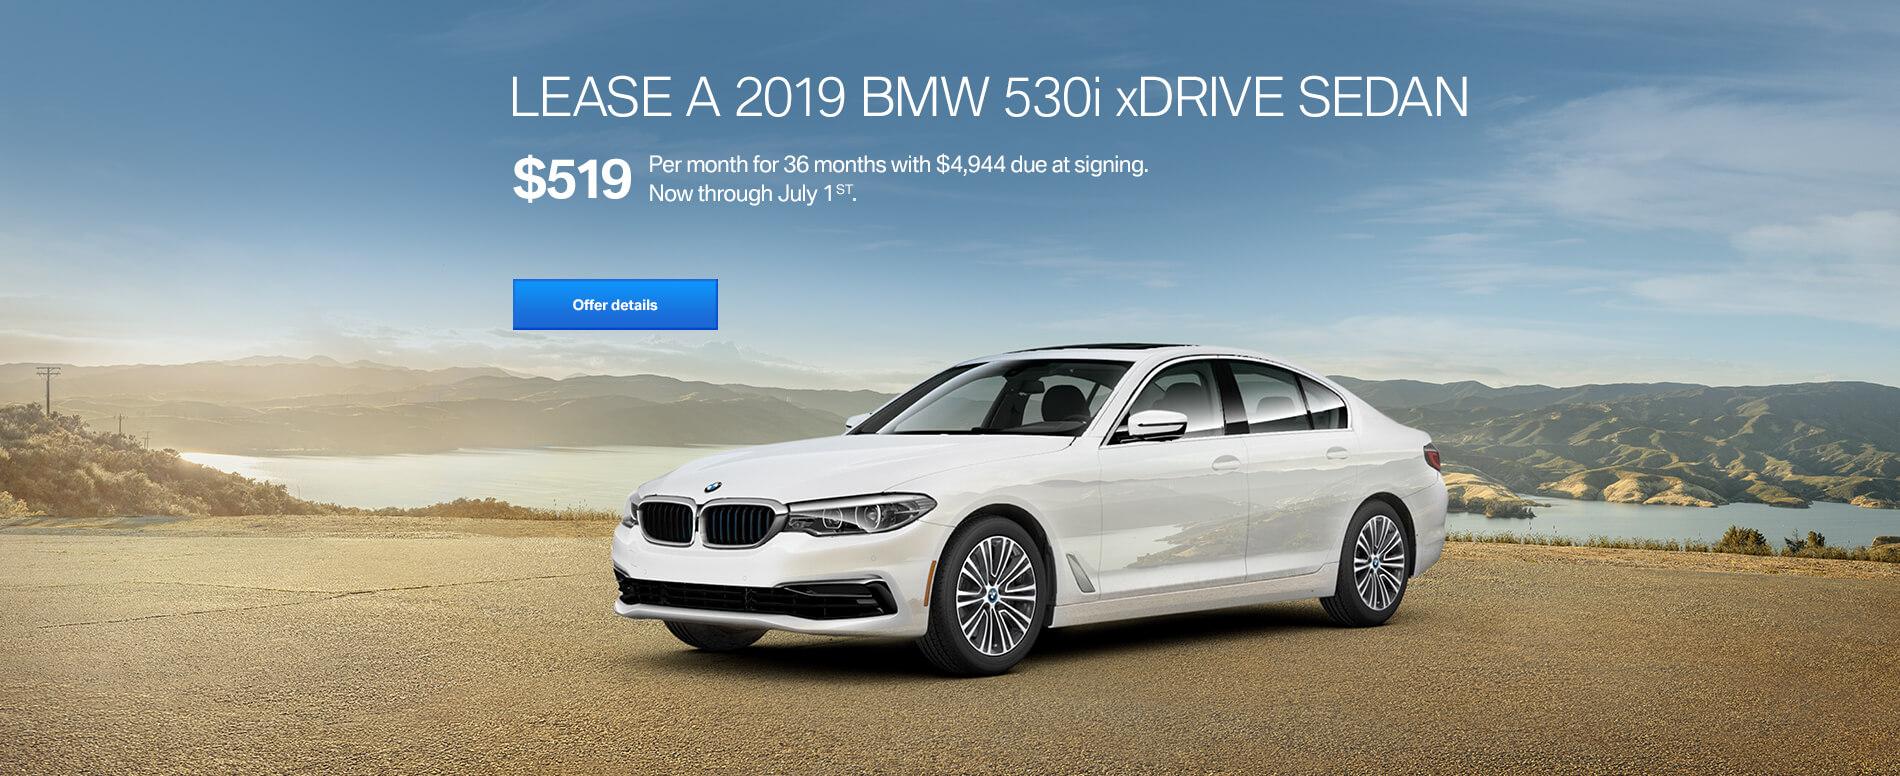 Bmw Dealership Near Me >> Bmw New Used Car Dealer Bergen County Nj New York Nyc Bmw